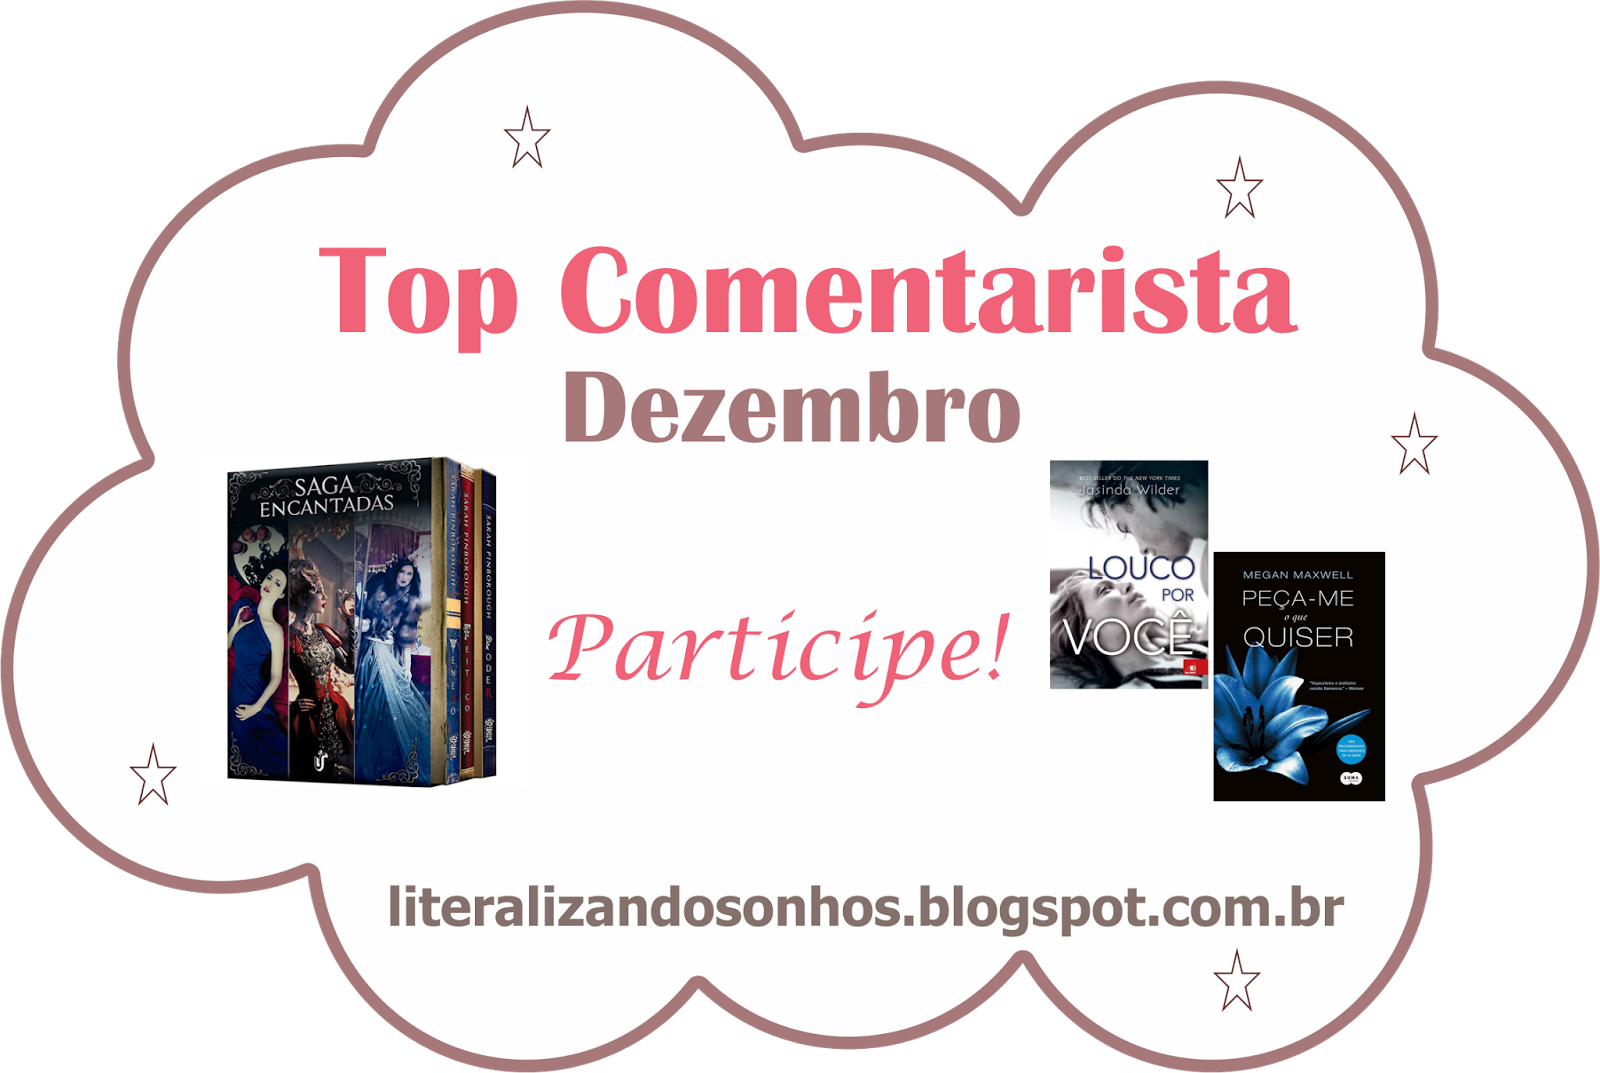 http://literalizandosonhos.blogspot.com.br/2014/12/top-comentarista-2-dezembro.html